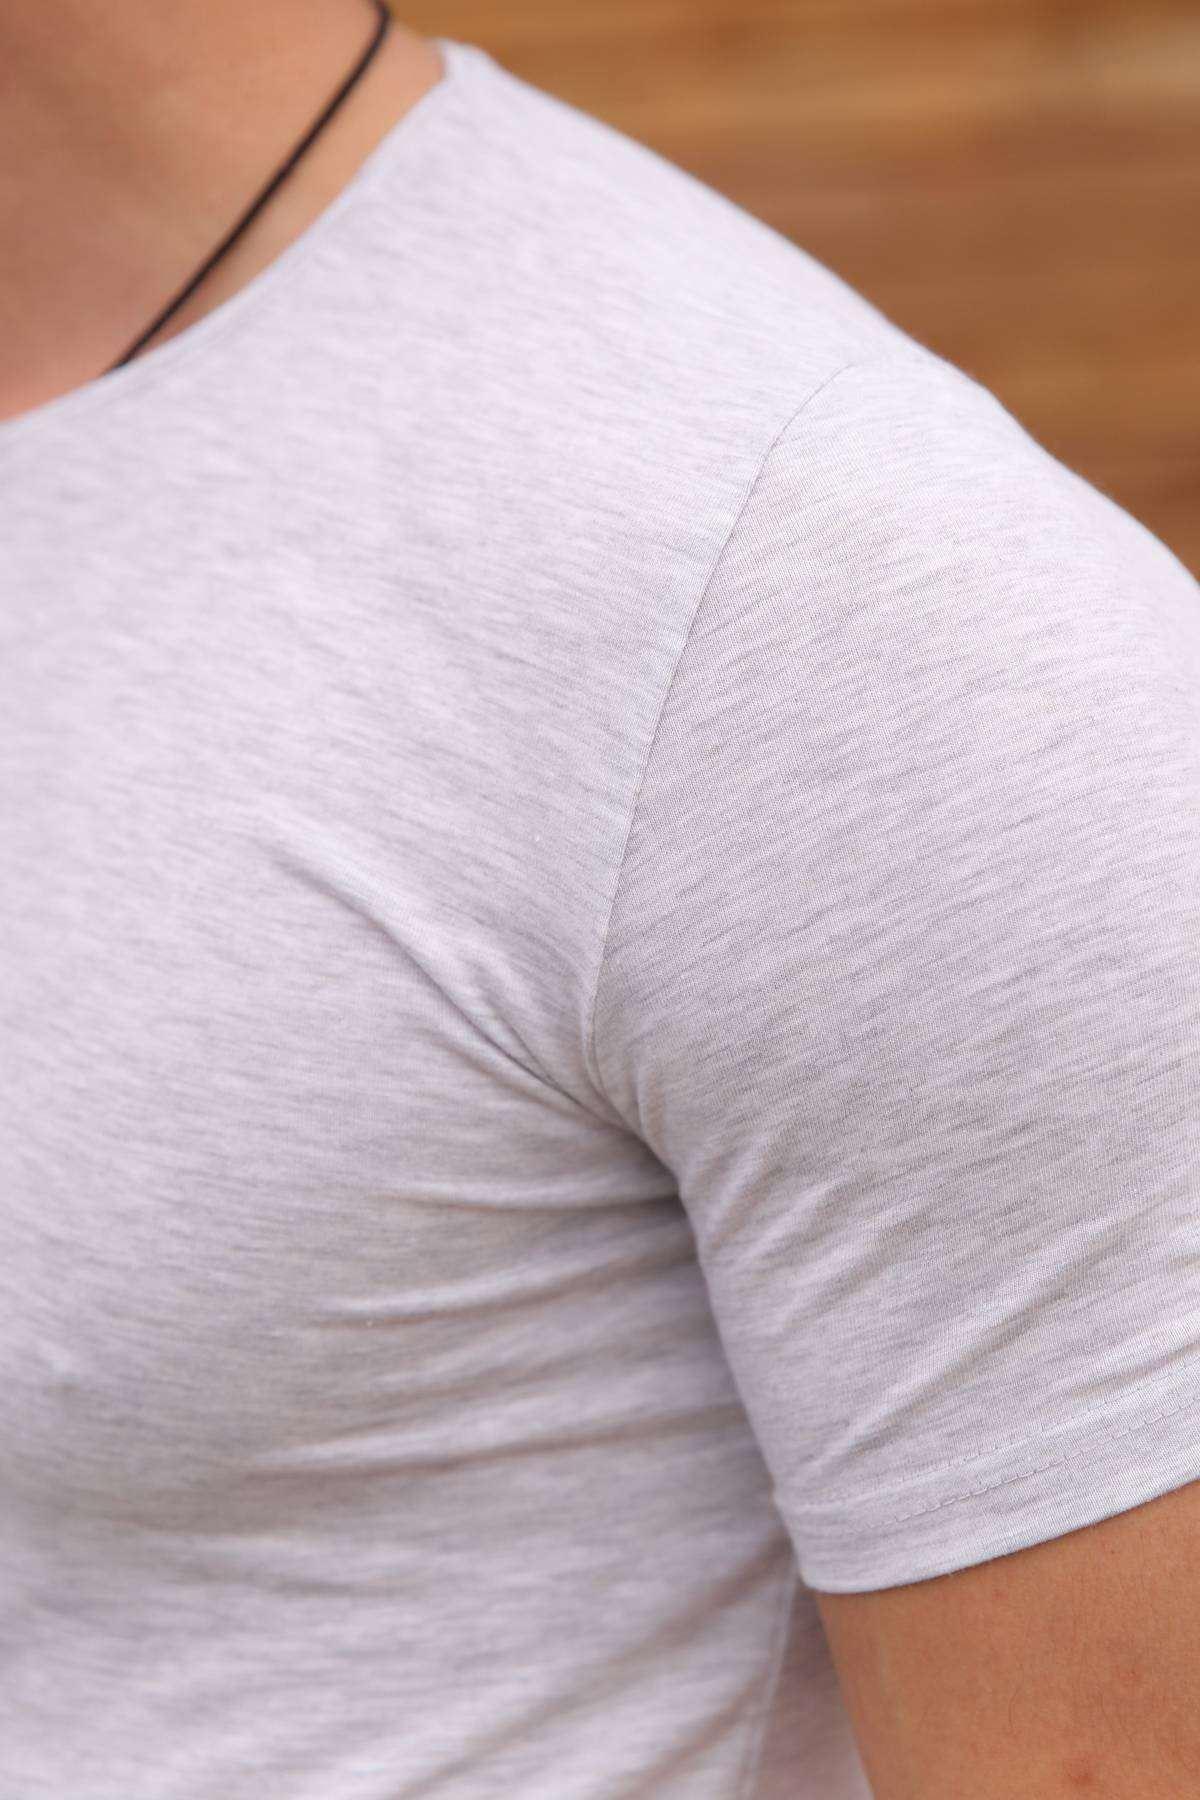 Erkek Açık Gri Bisiklet Yaka Düz Basic Tişört Tshirt